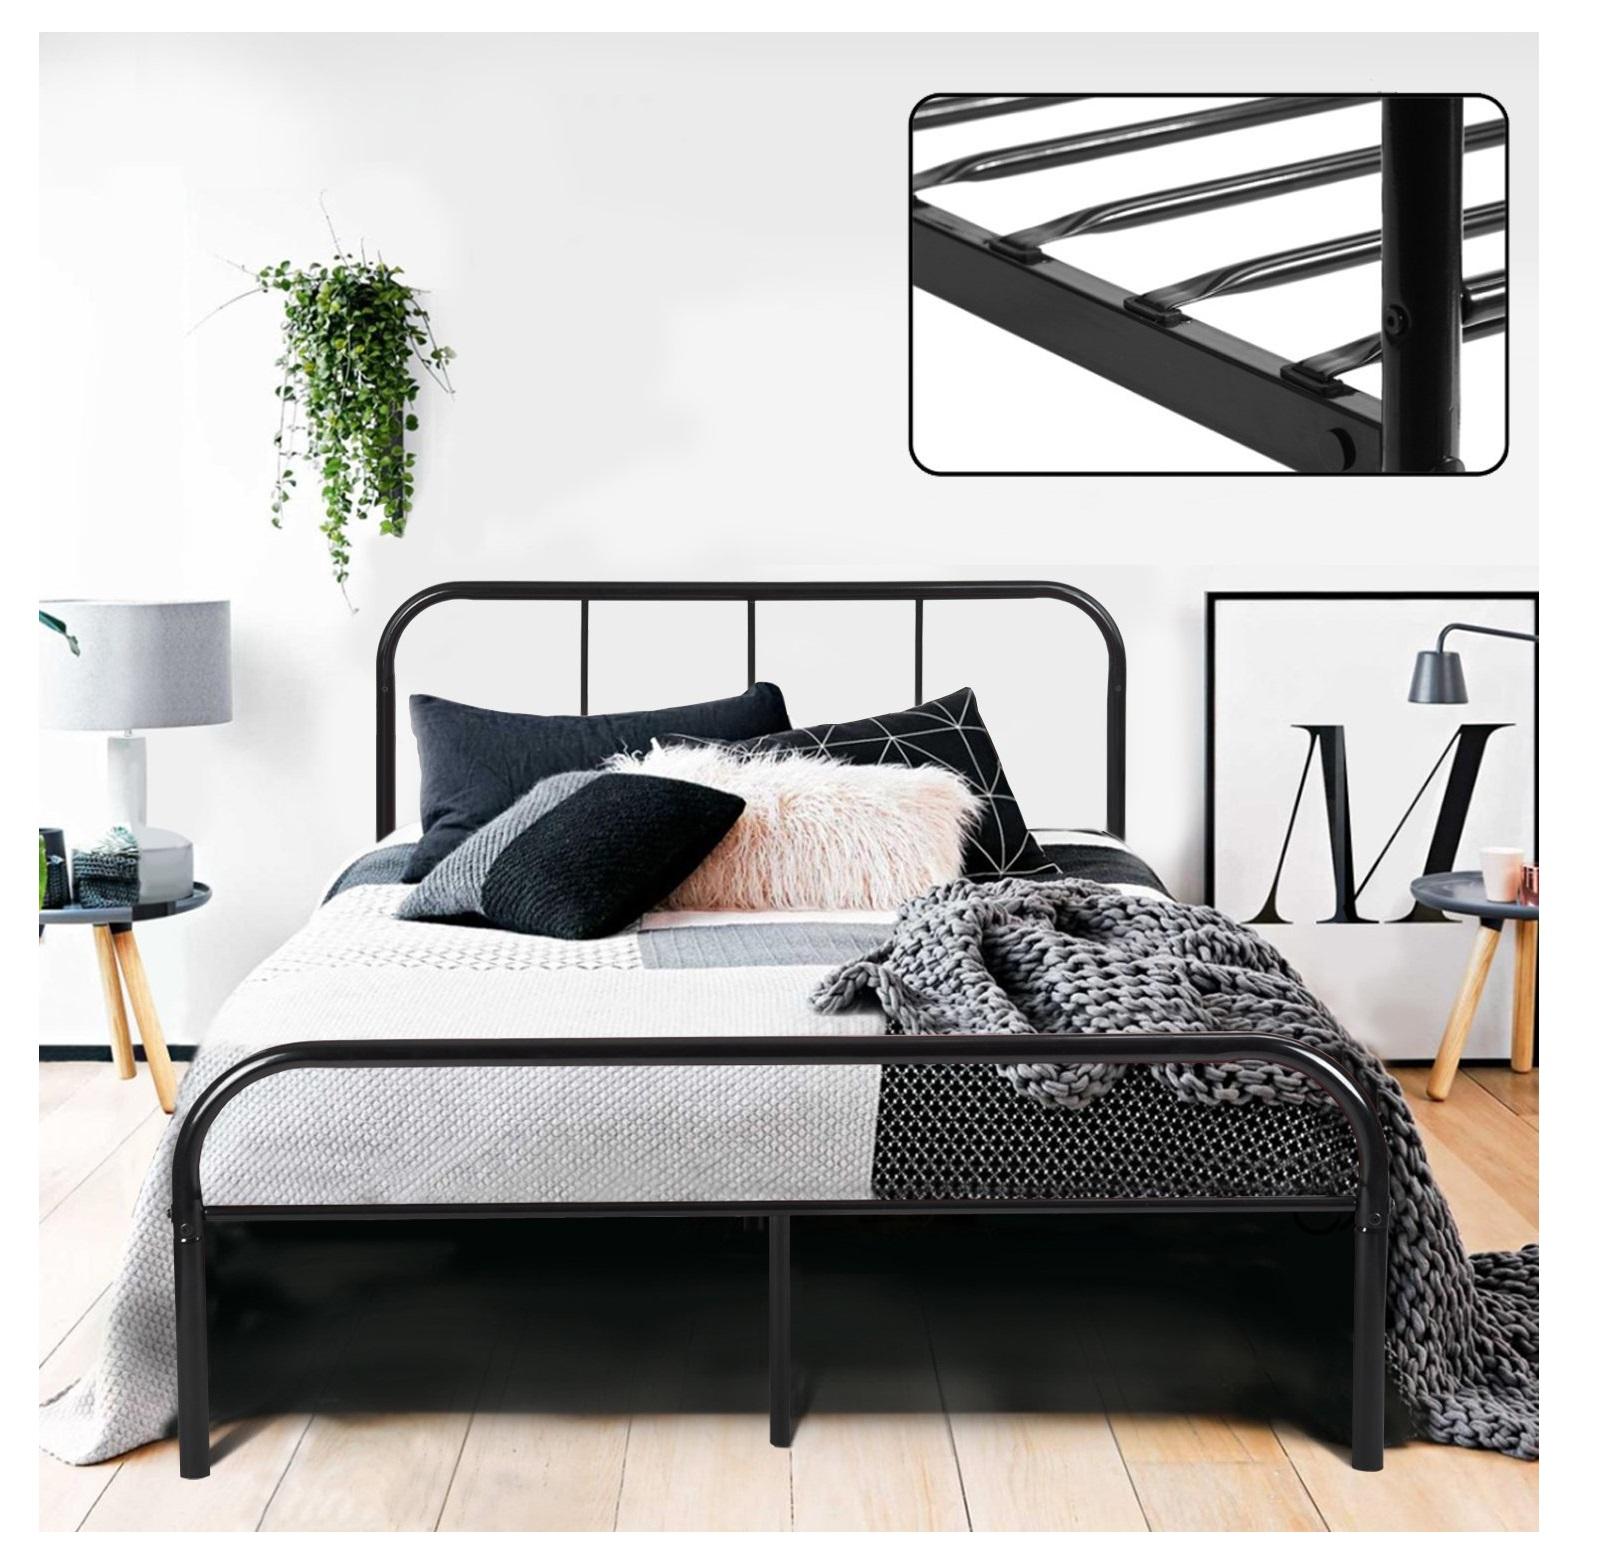 łóżko Podwójne Rama Czarne Metalowe Coavas Ccc184